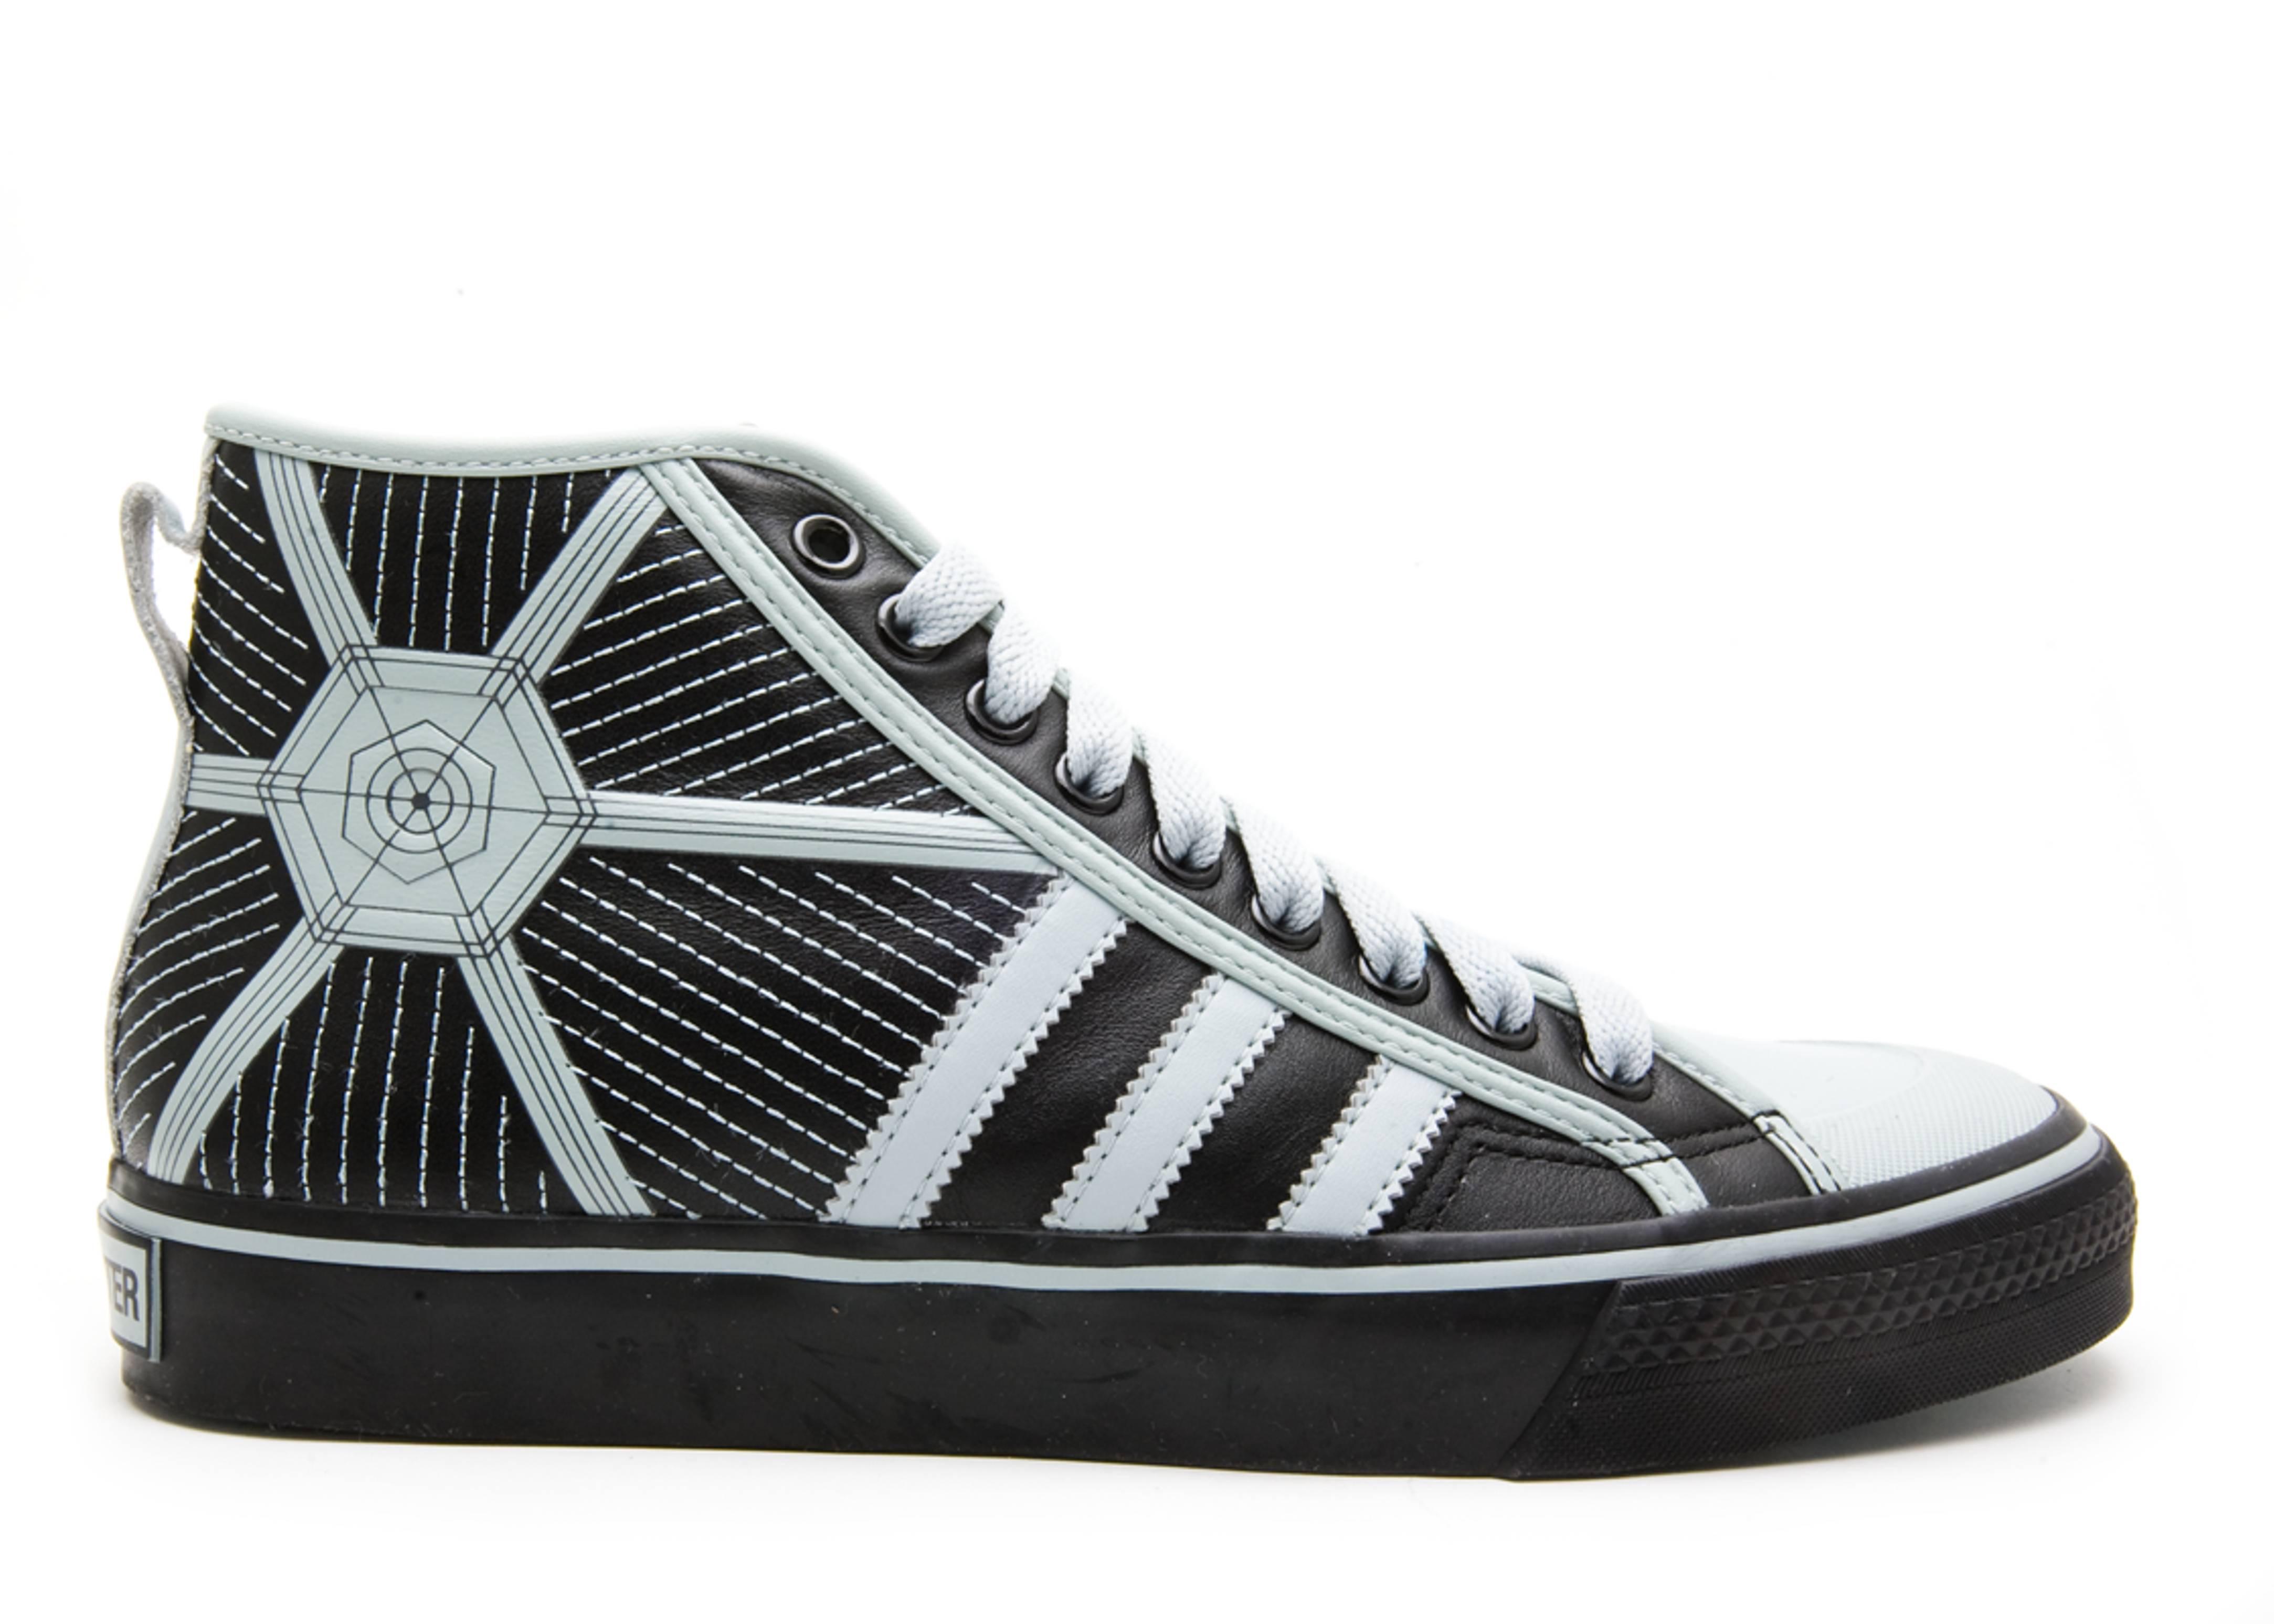 adidas Schoenen EQT Support RF Zwart Wit BB1312 runstormon